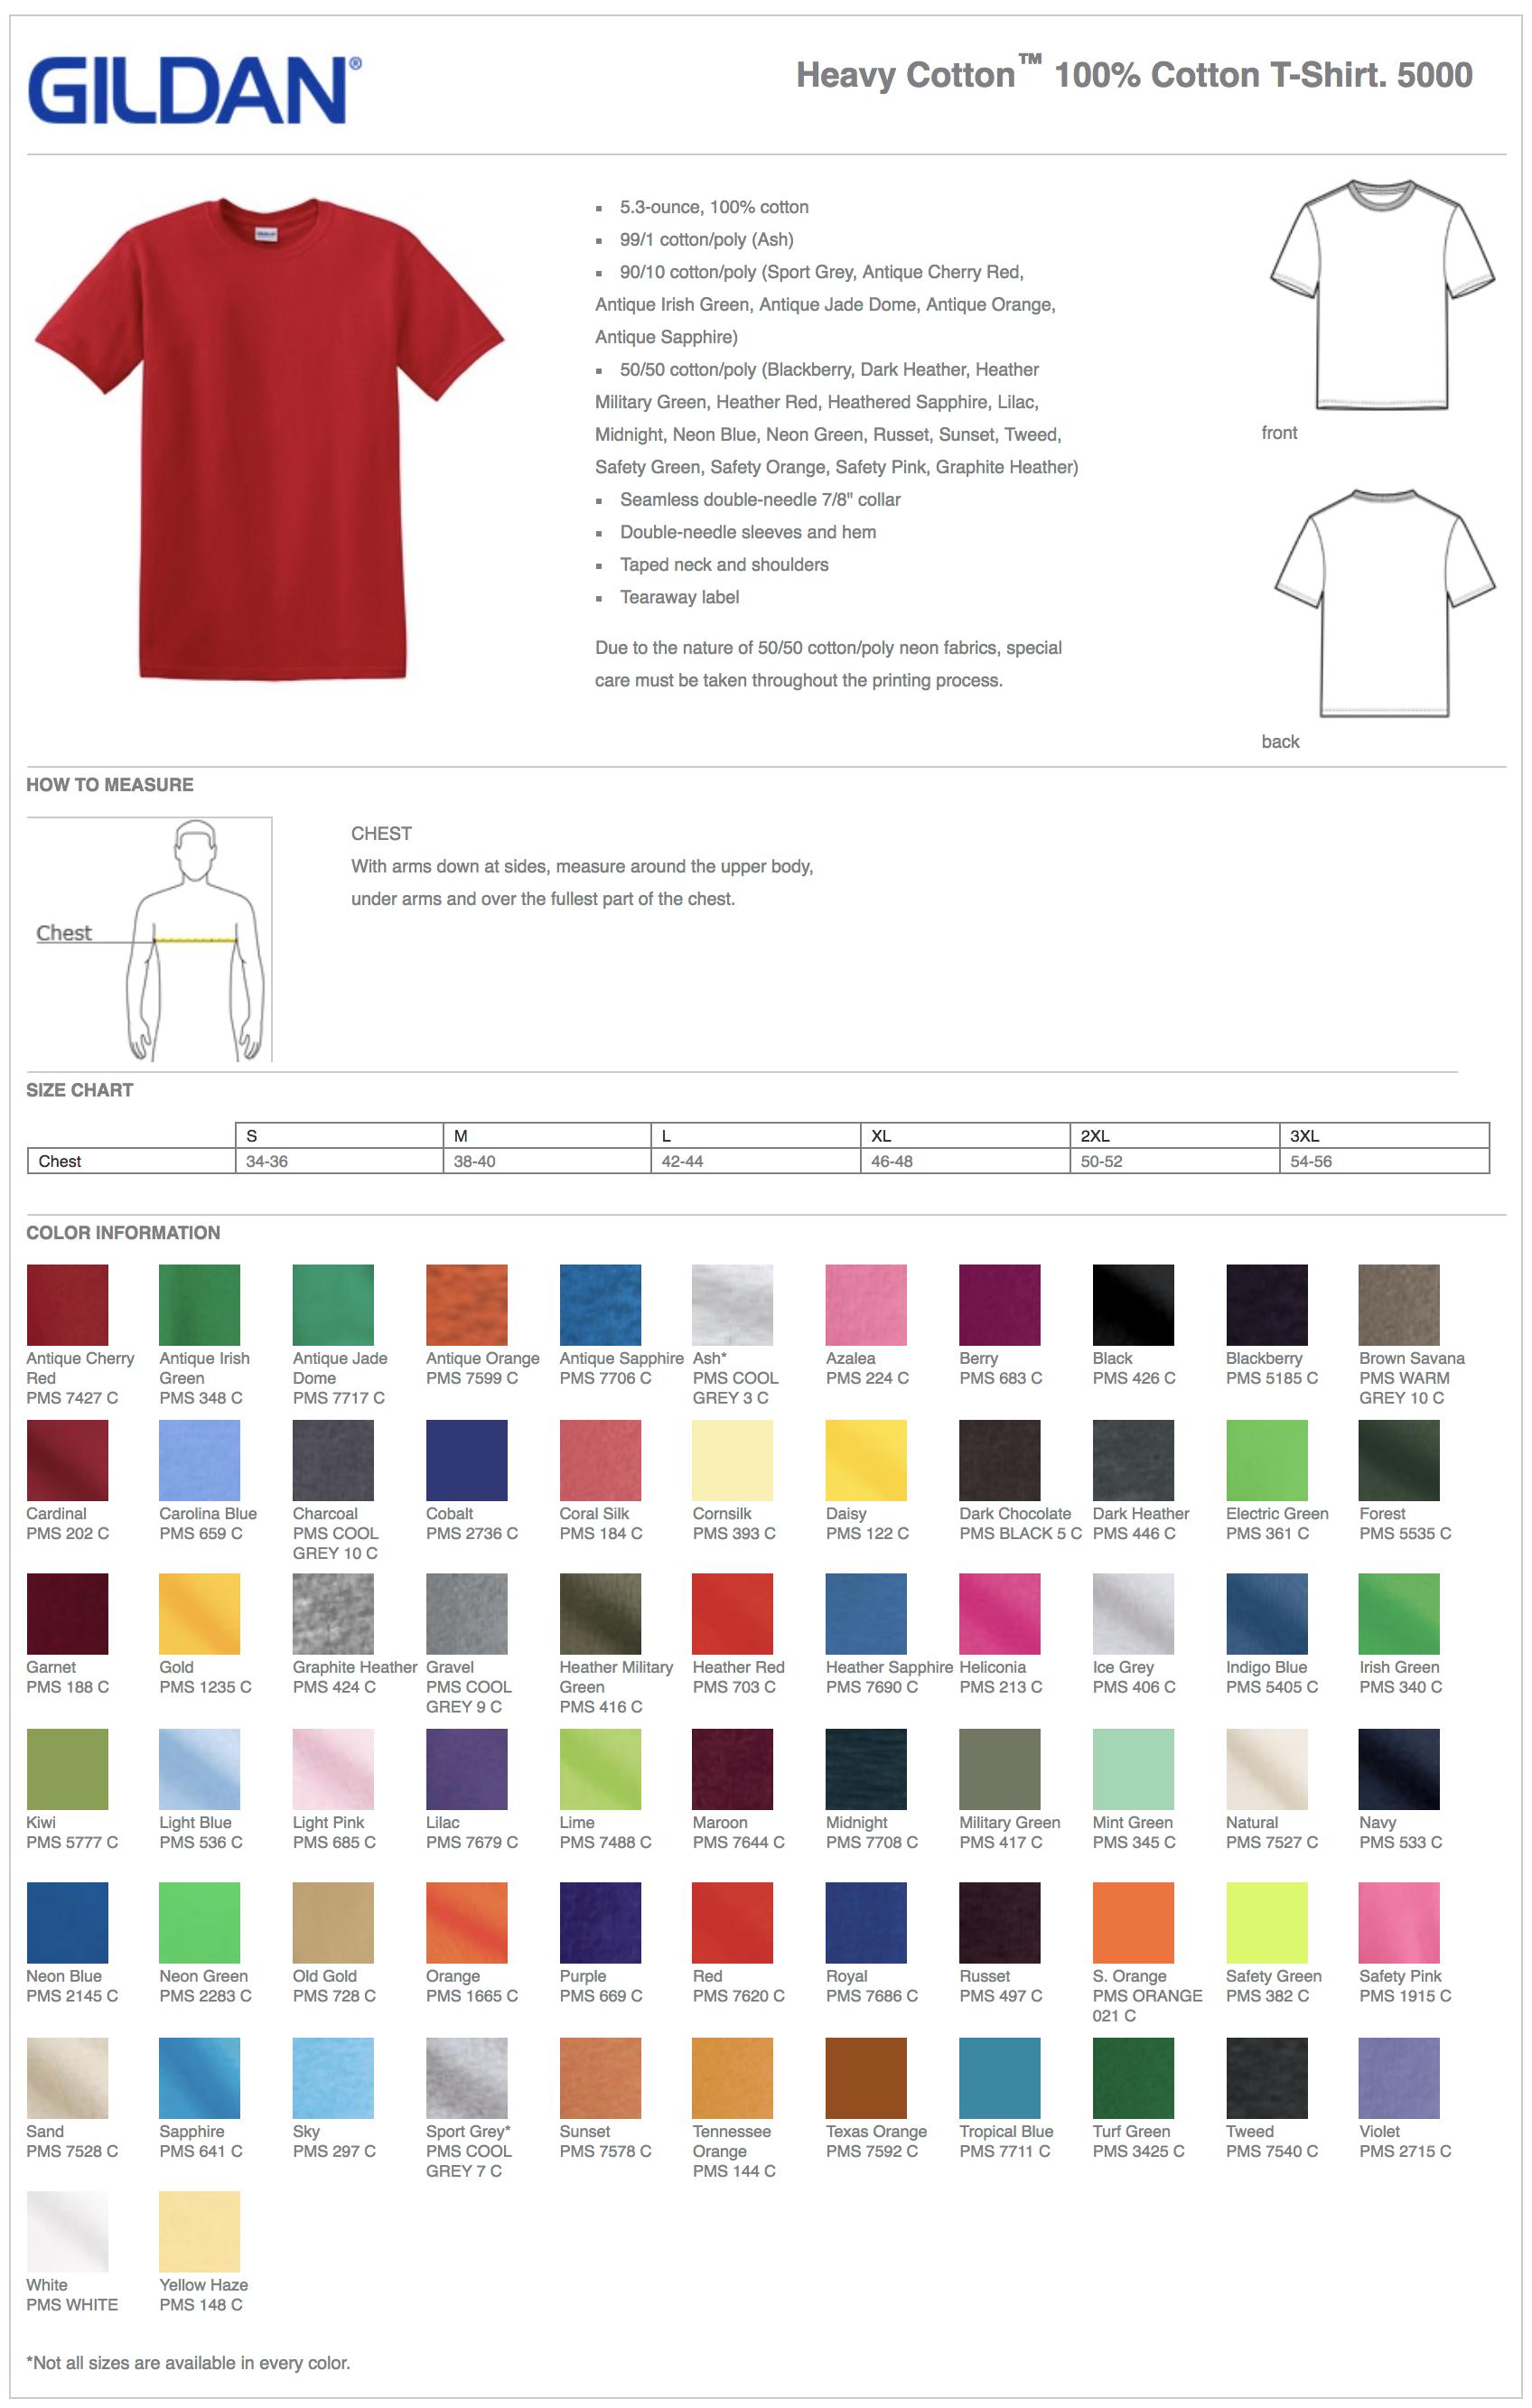 Gildan 5000 Shirt Color Chart